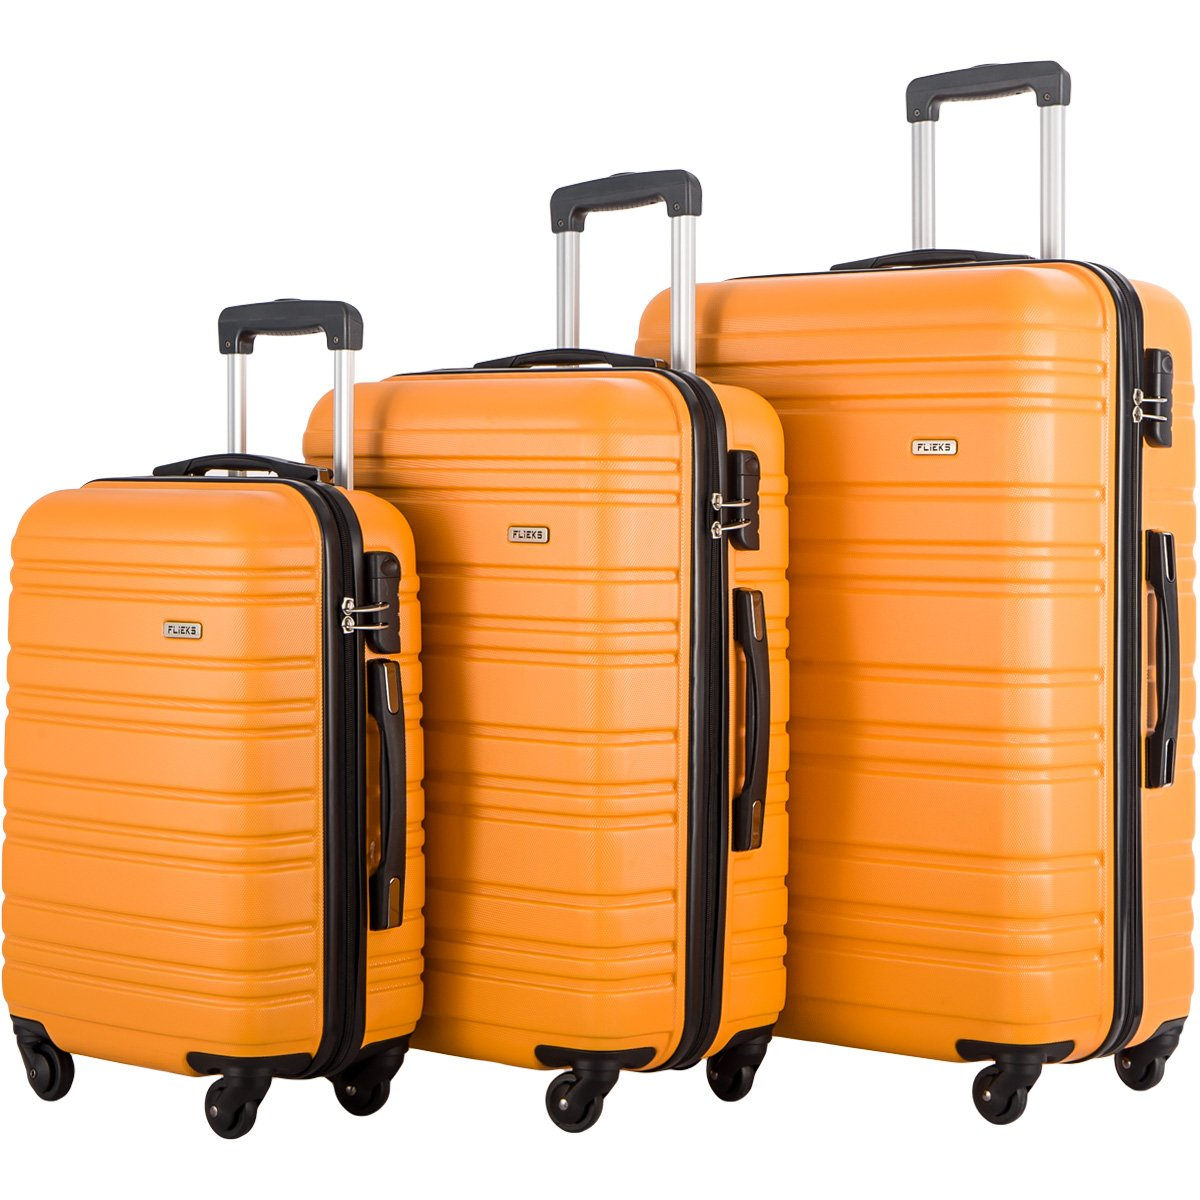 FLIEKS Luggages 3 Piece Luggage Set Spinner Suitcase (Orange)